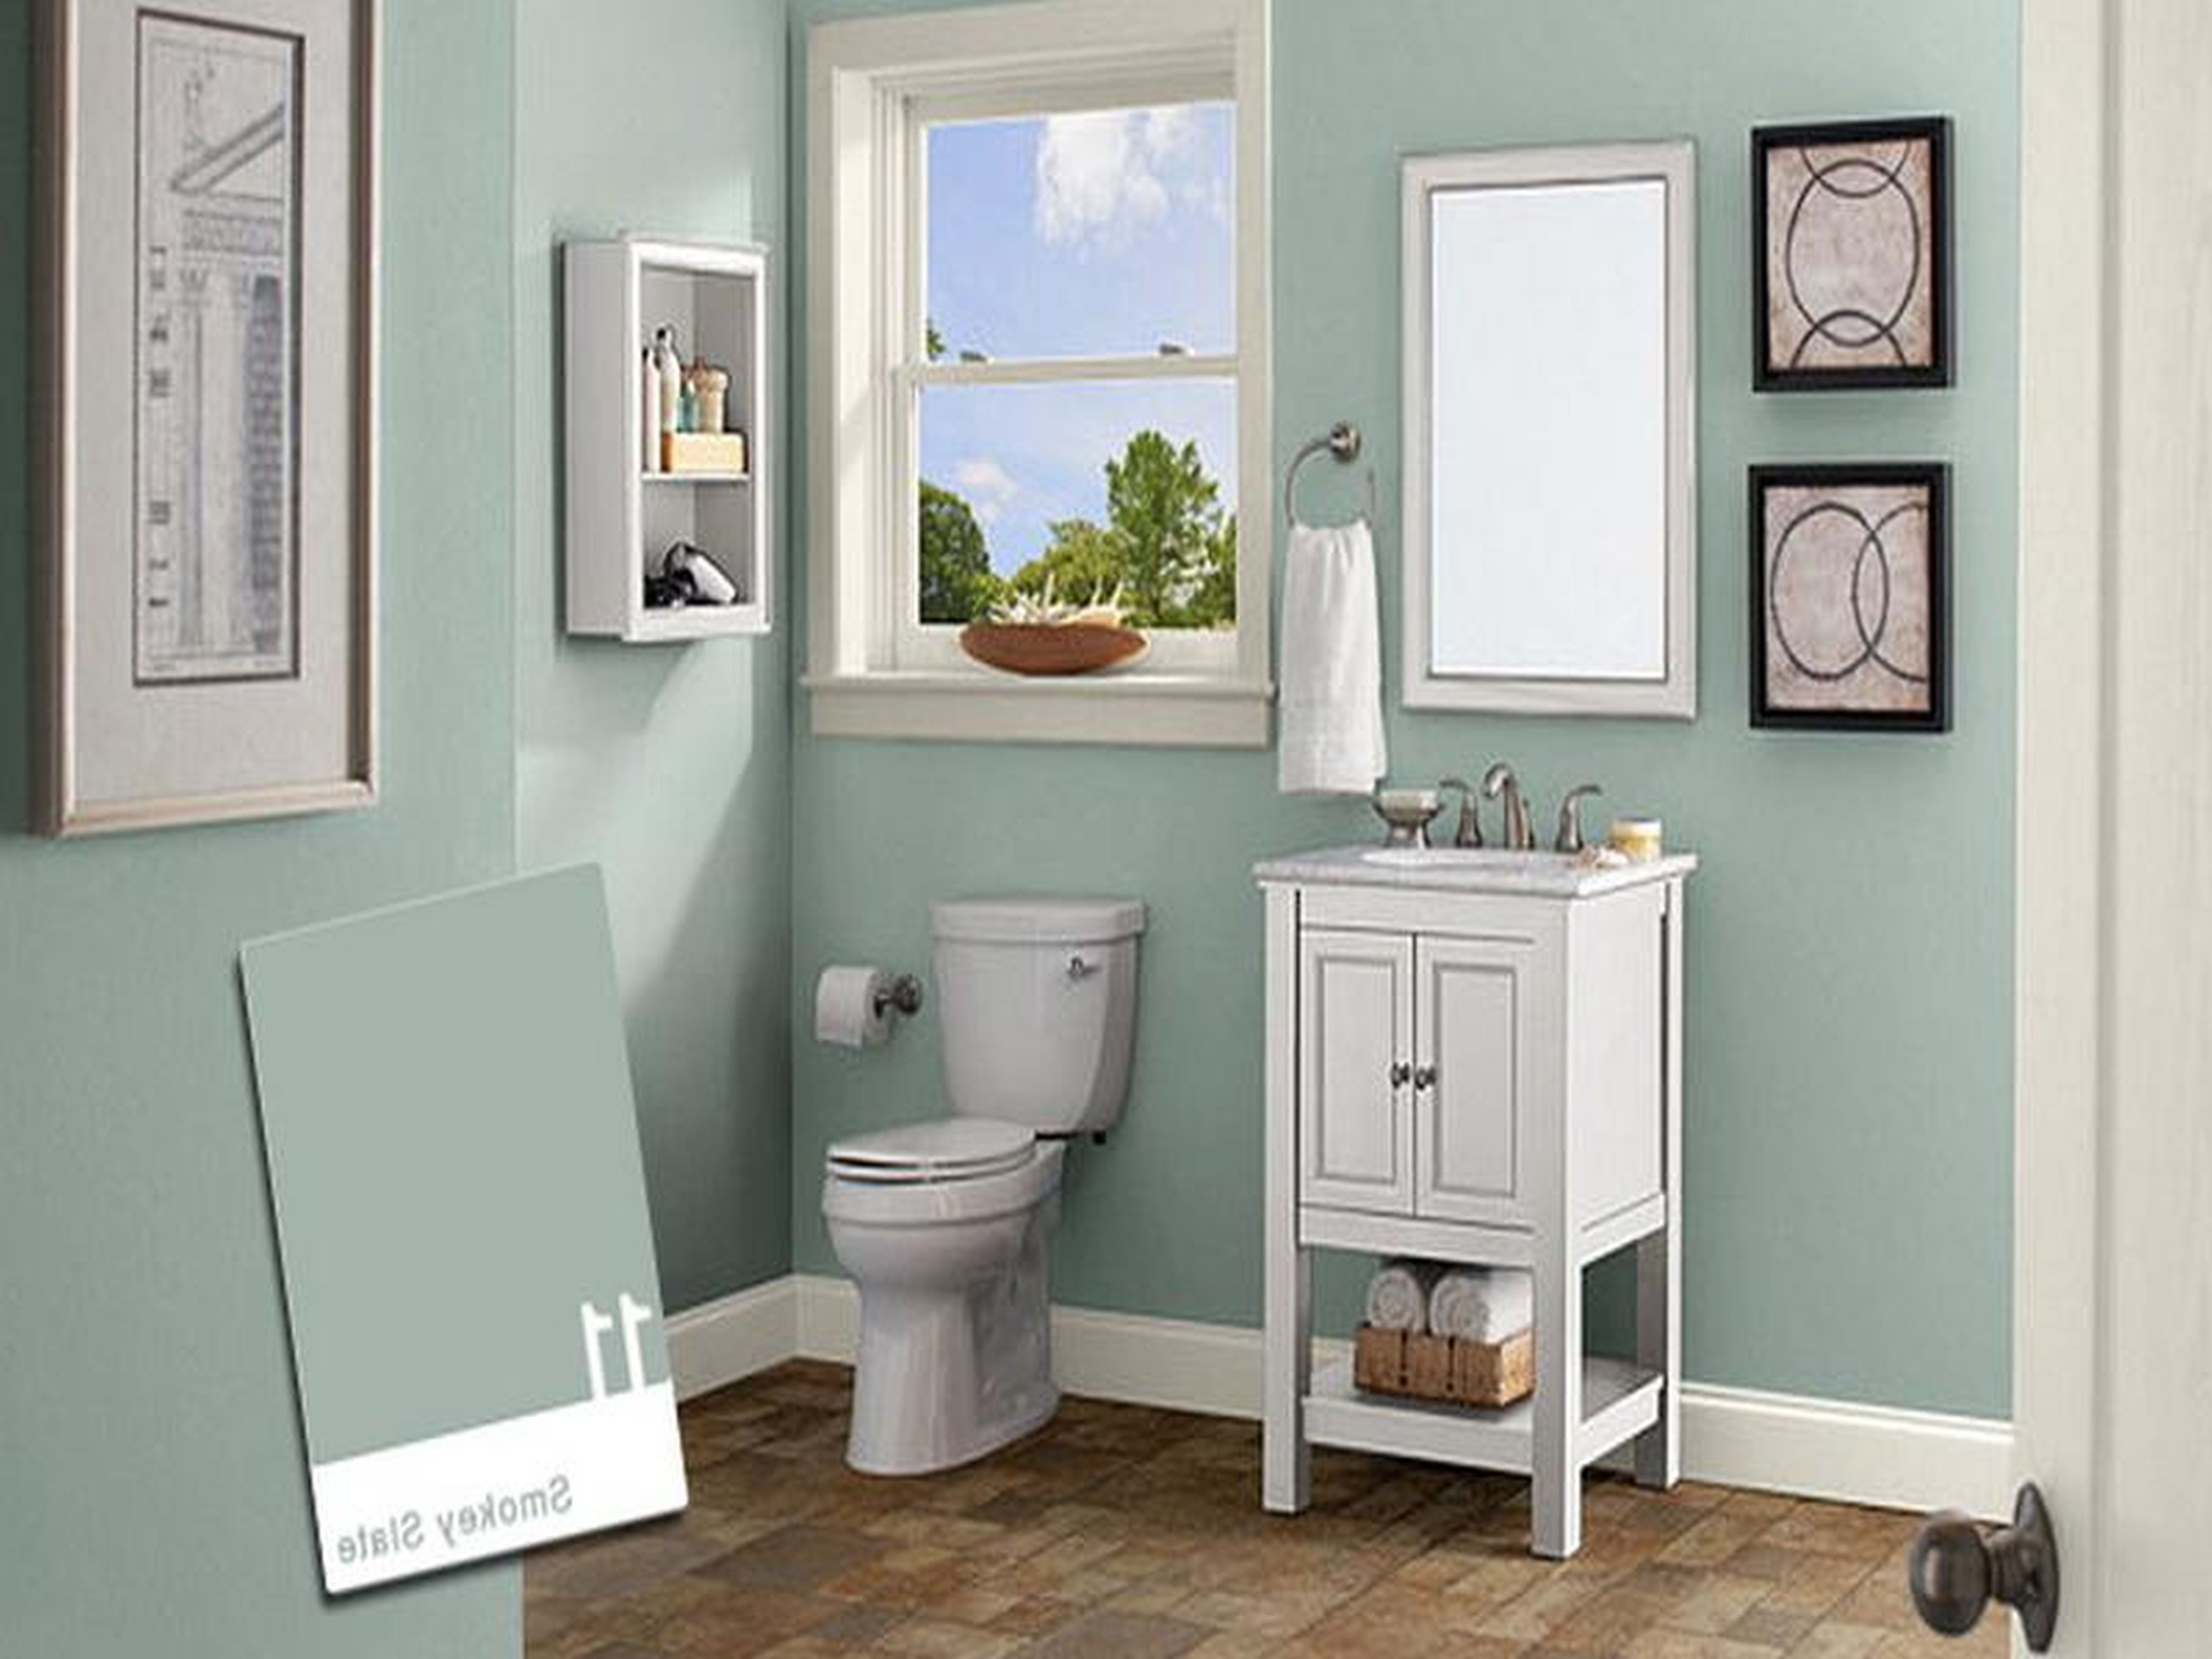 Paint Colors for Bathrooms Excellent Bathroom Paint Colors Collection Bathroom Ideas Gallery